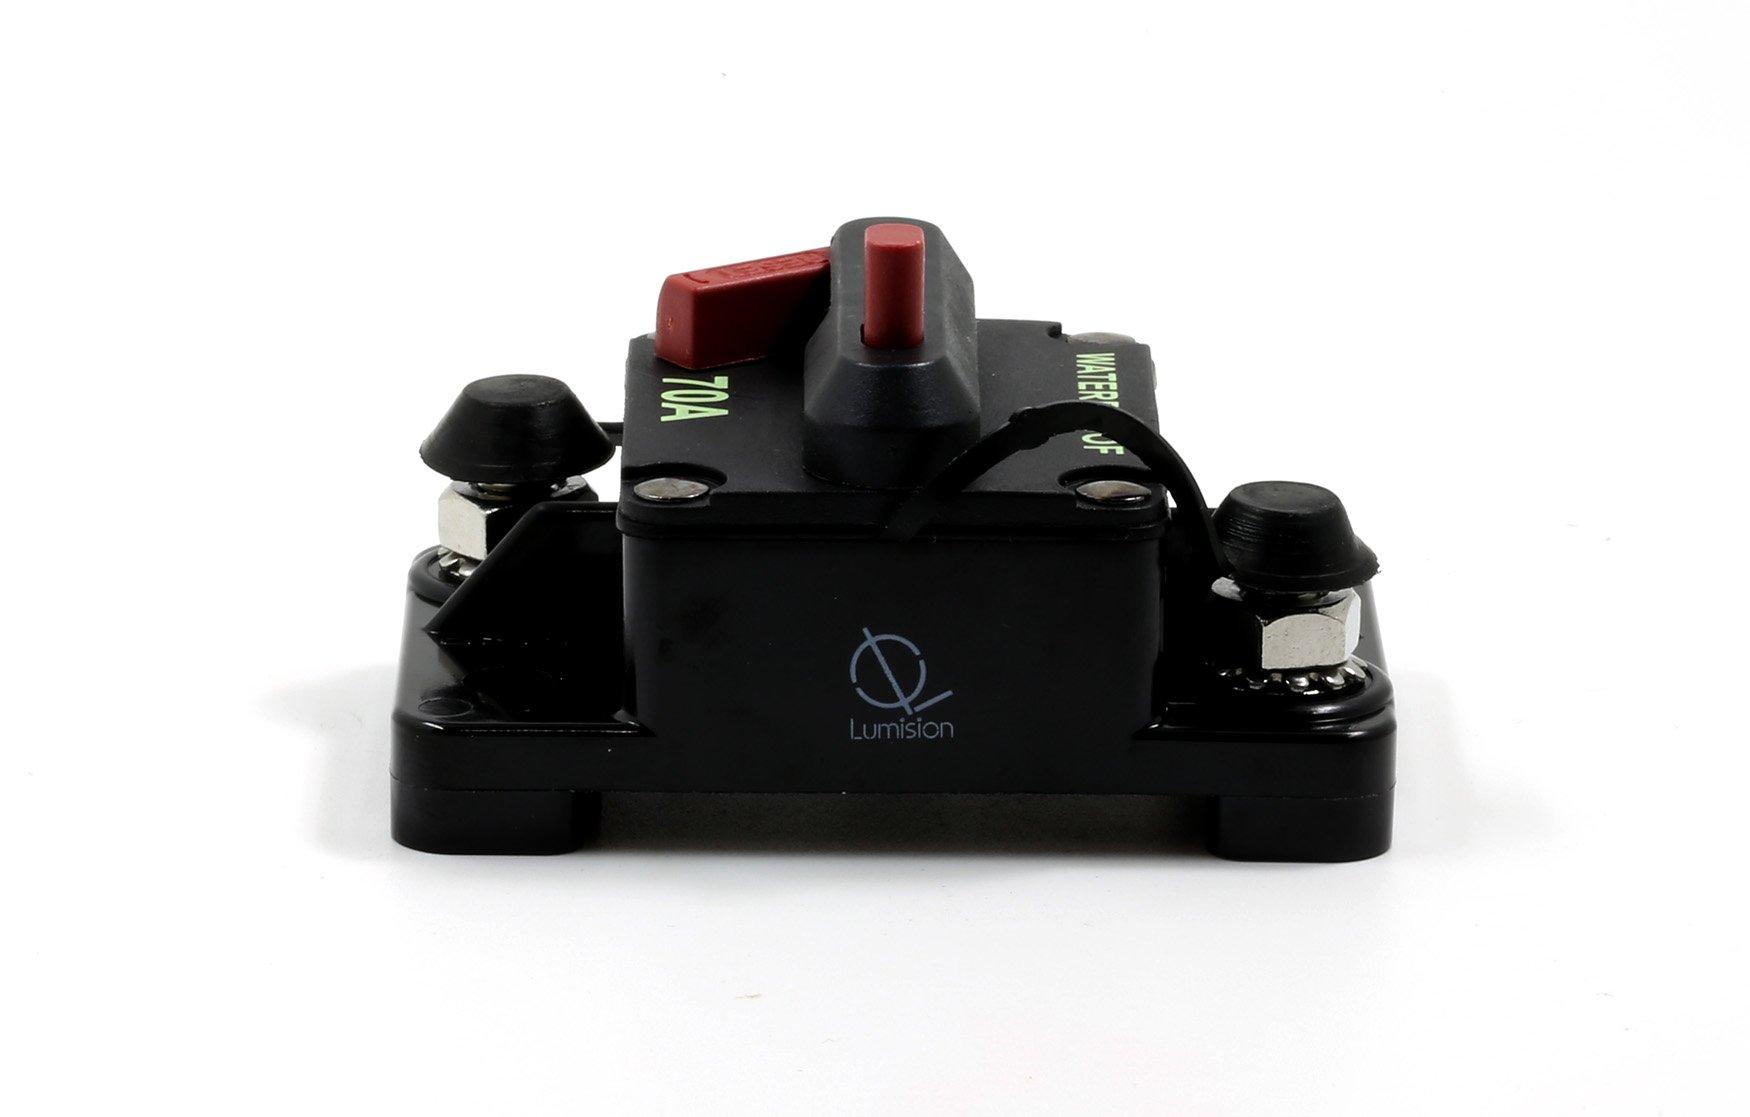 Lumision Waterproof Automotive Circuit Breaker Manual Reset upto 48VDC 70AMP by Lumision (Image #6)